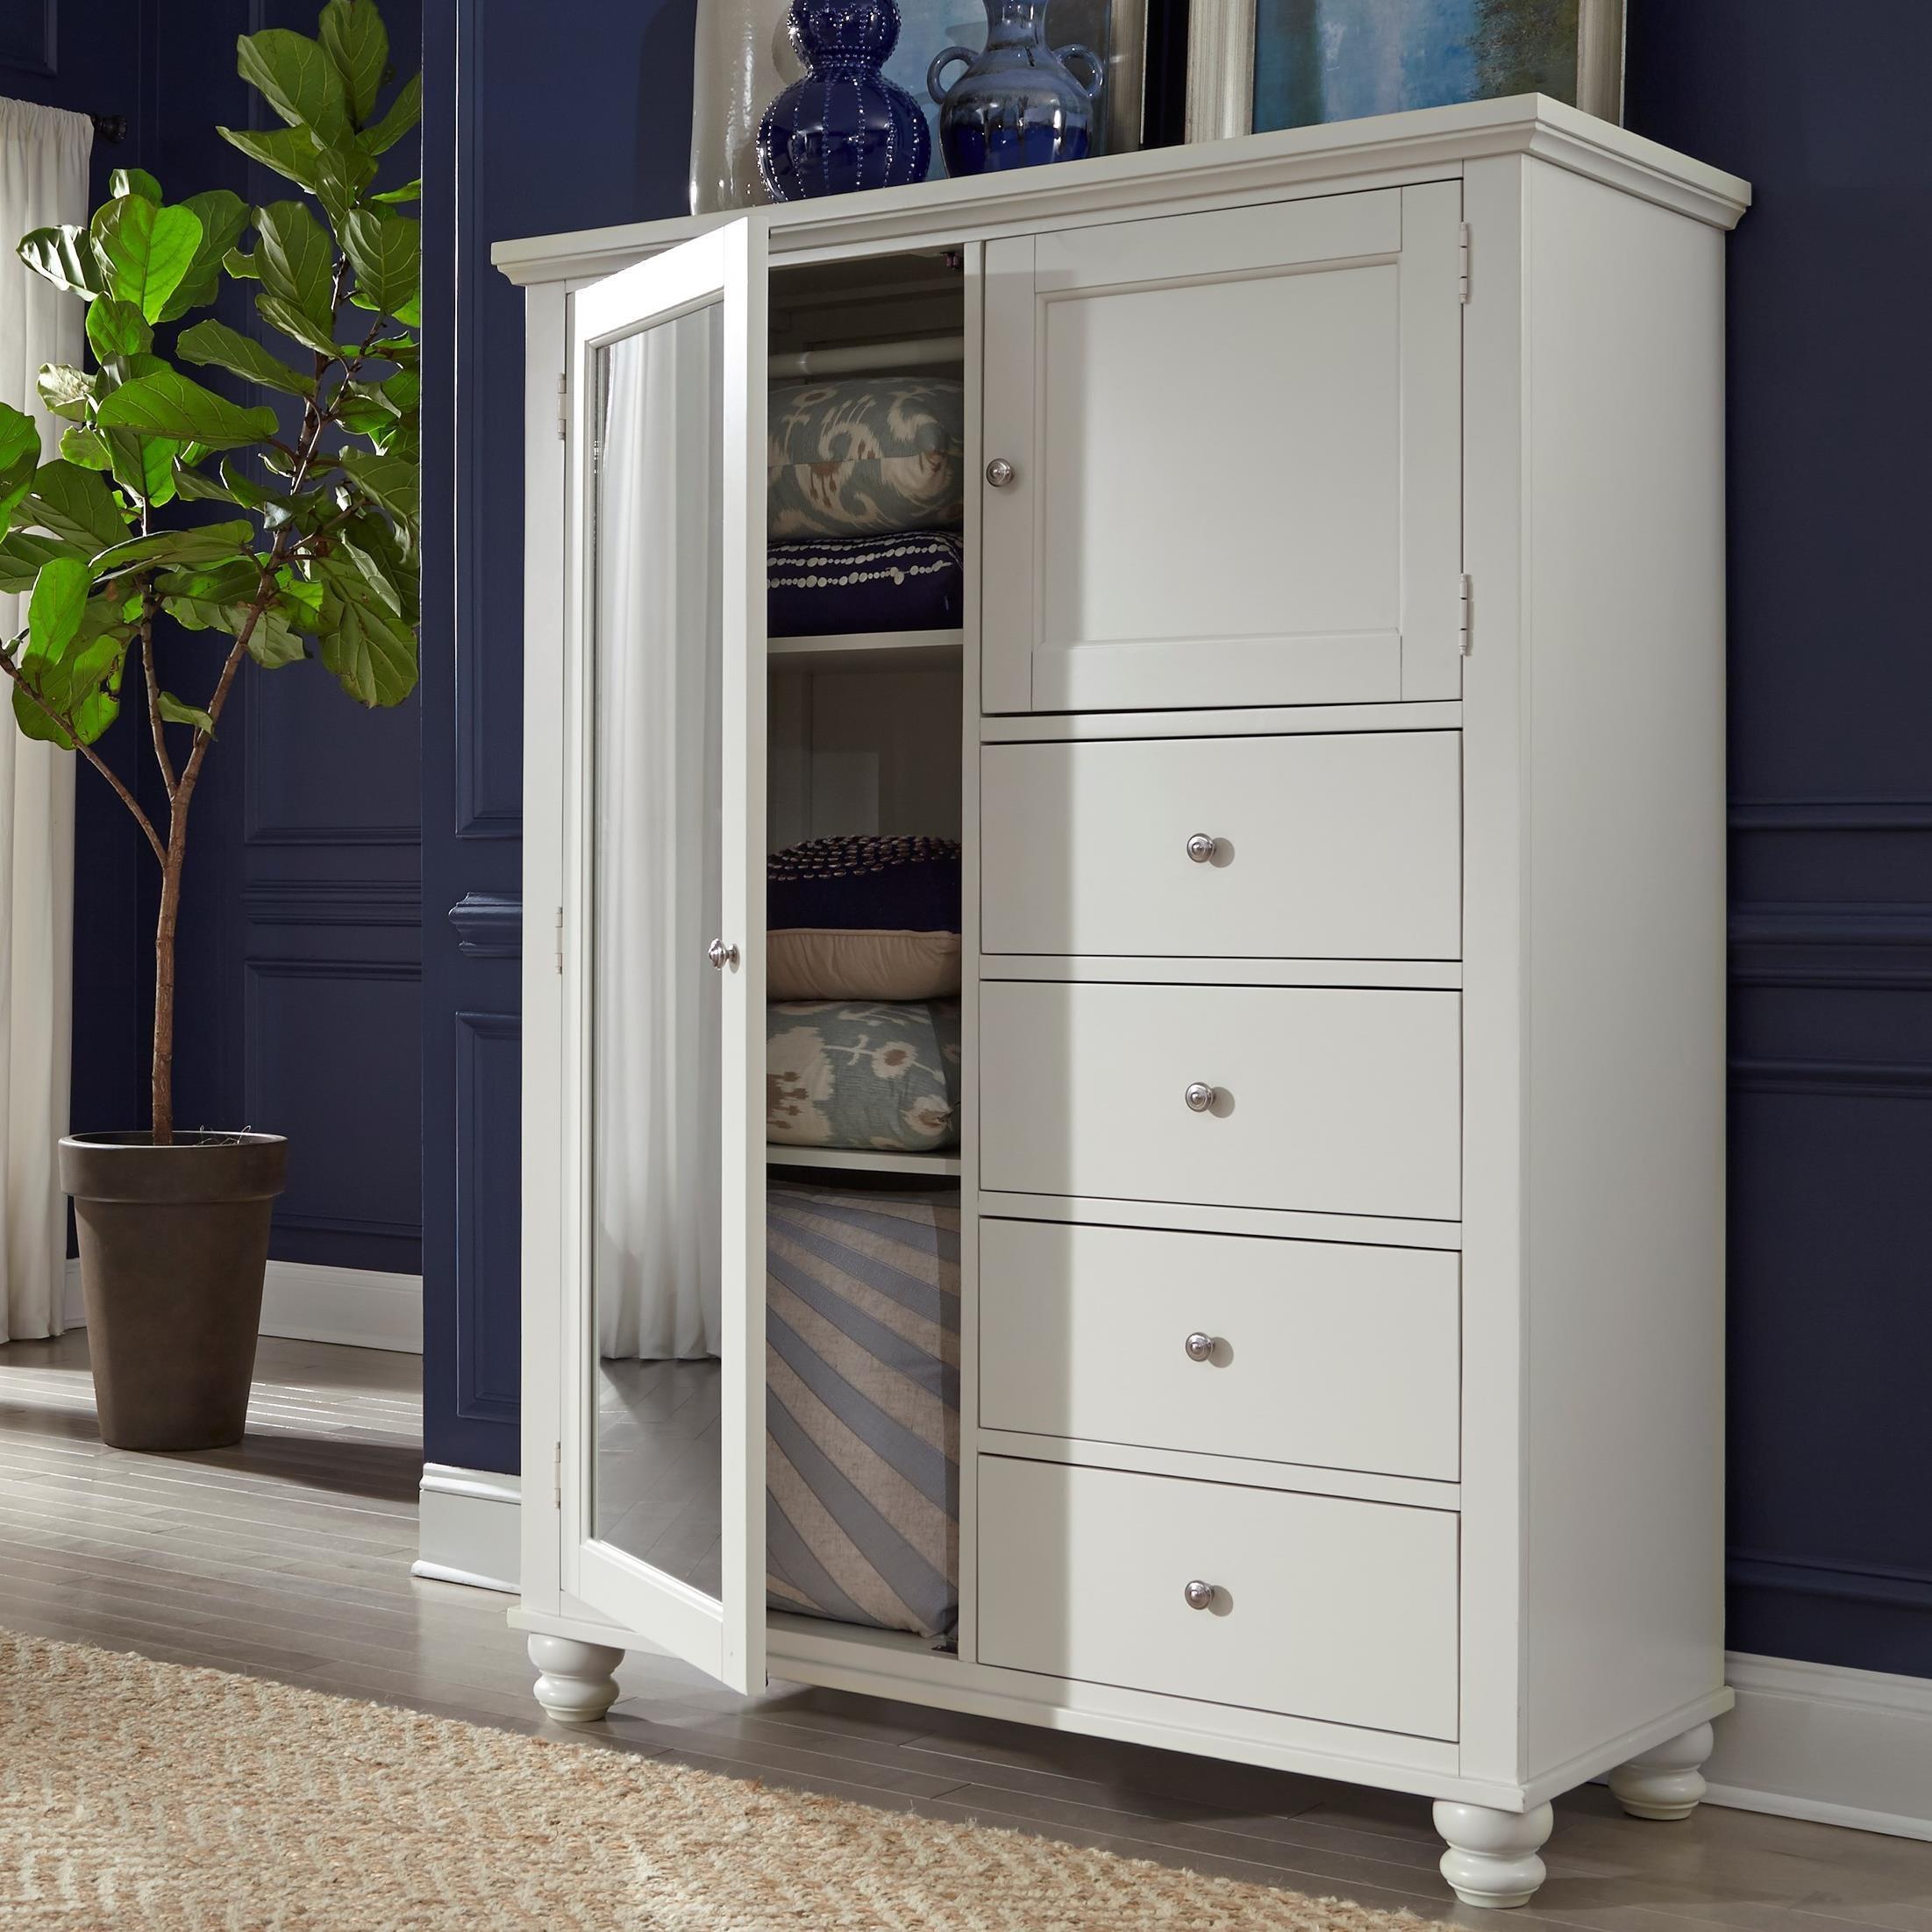 Cambridge 4 drawer 2 Door Chiffarobe  by Aspenhome at Walker's Furniture